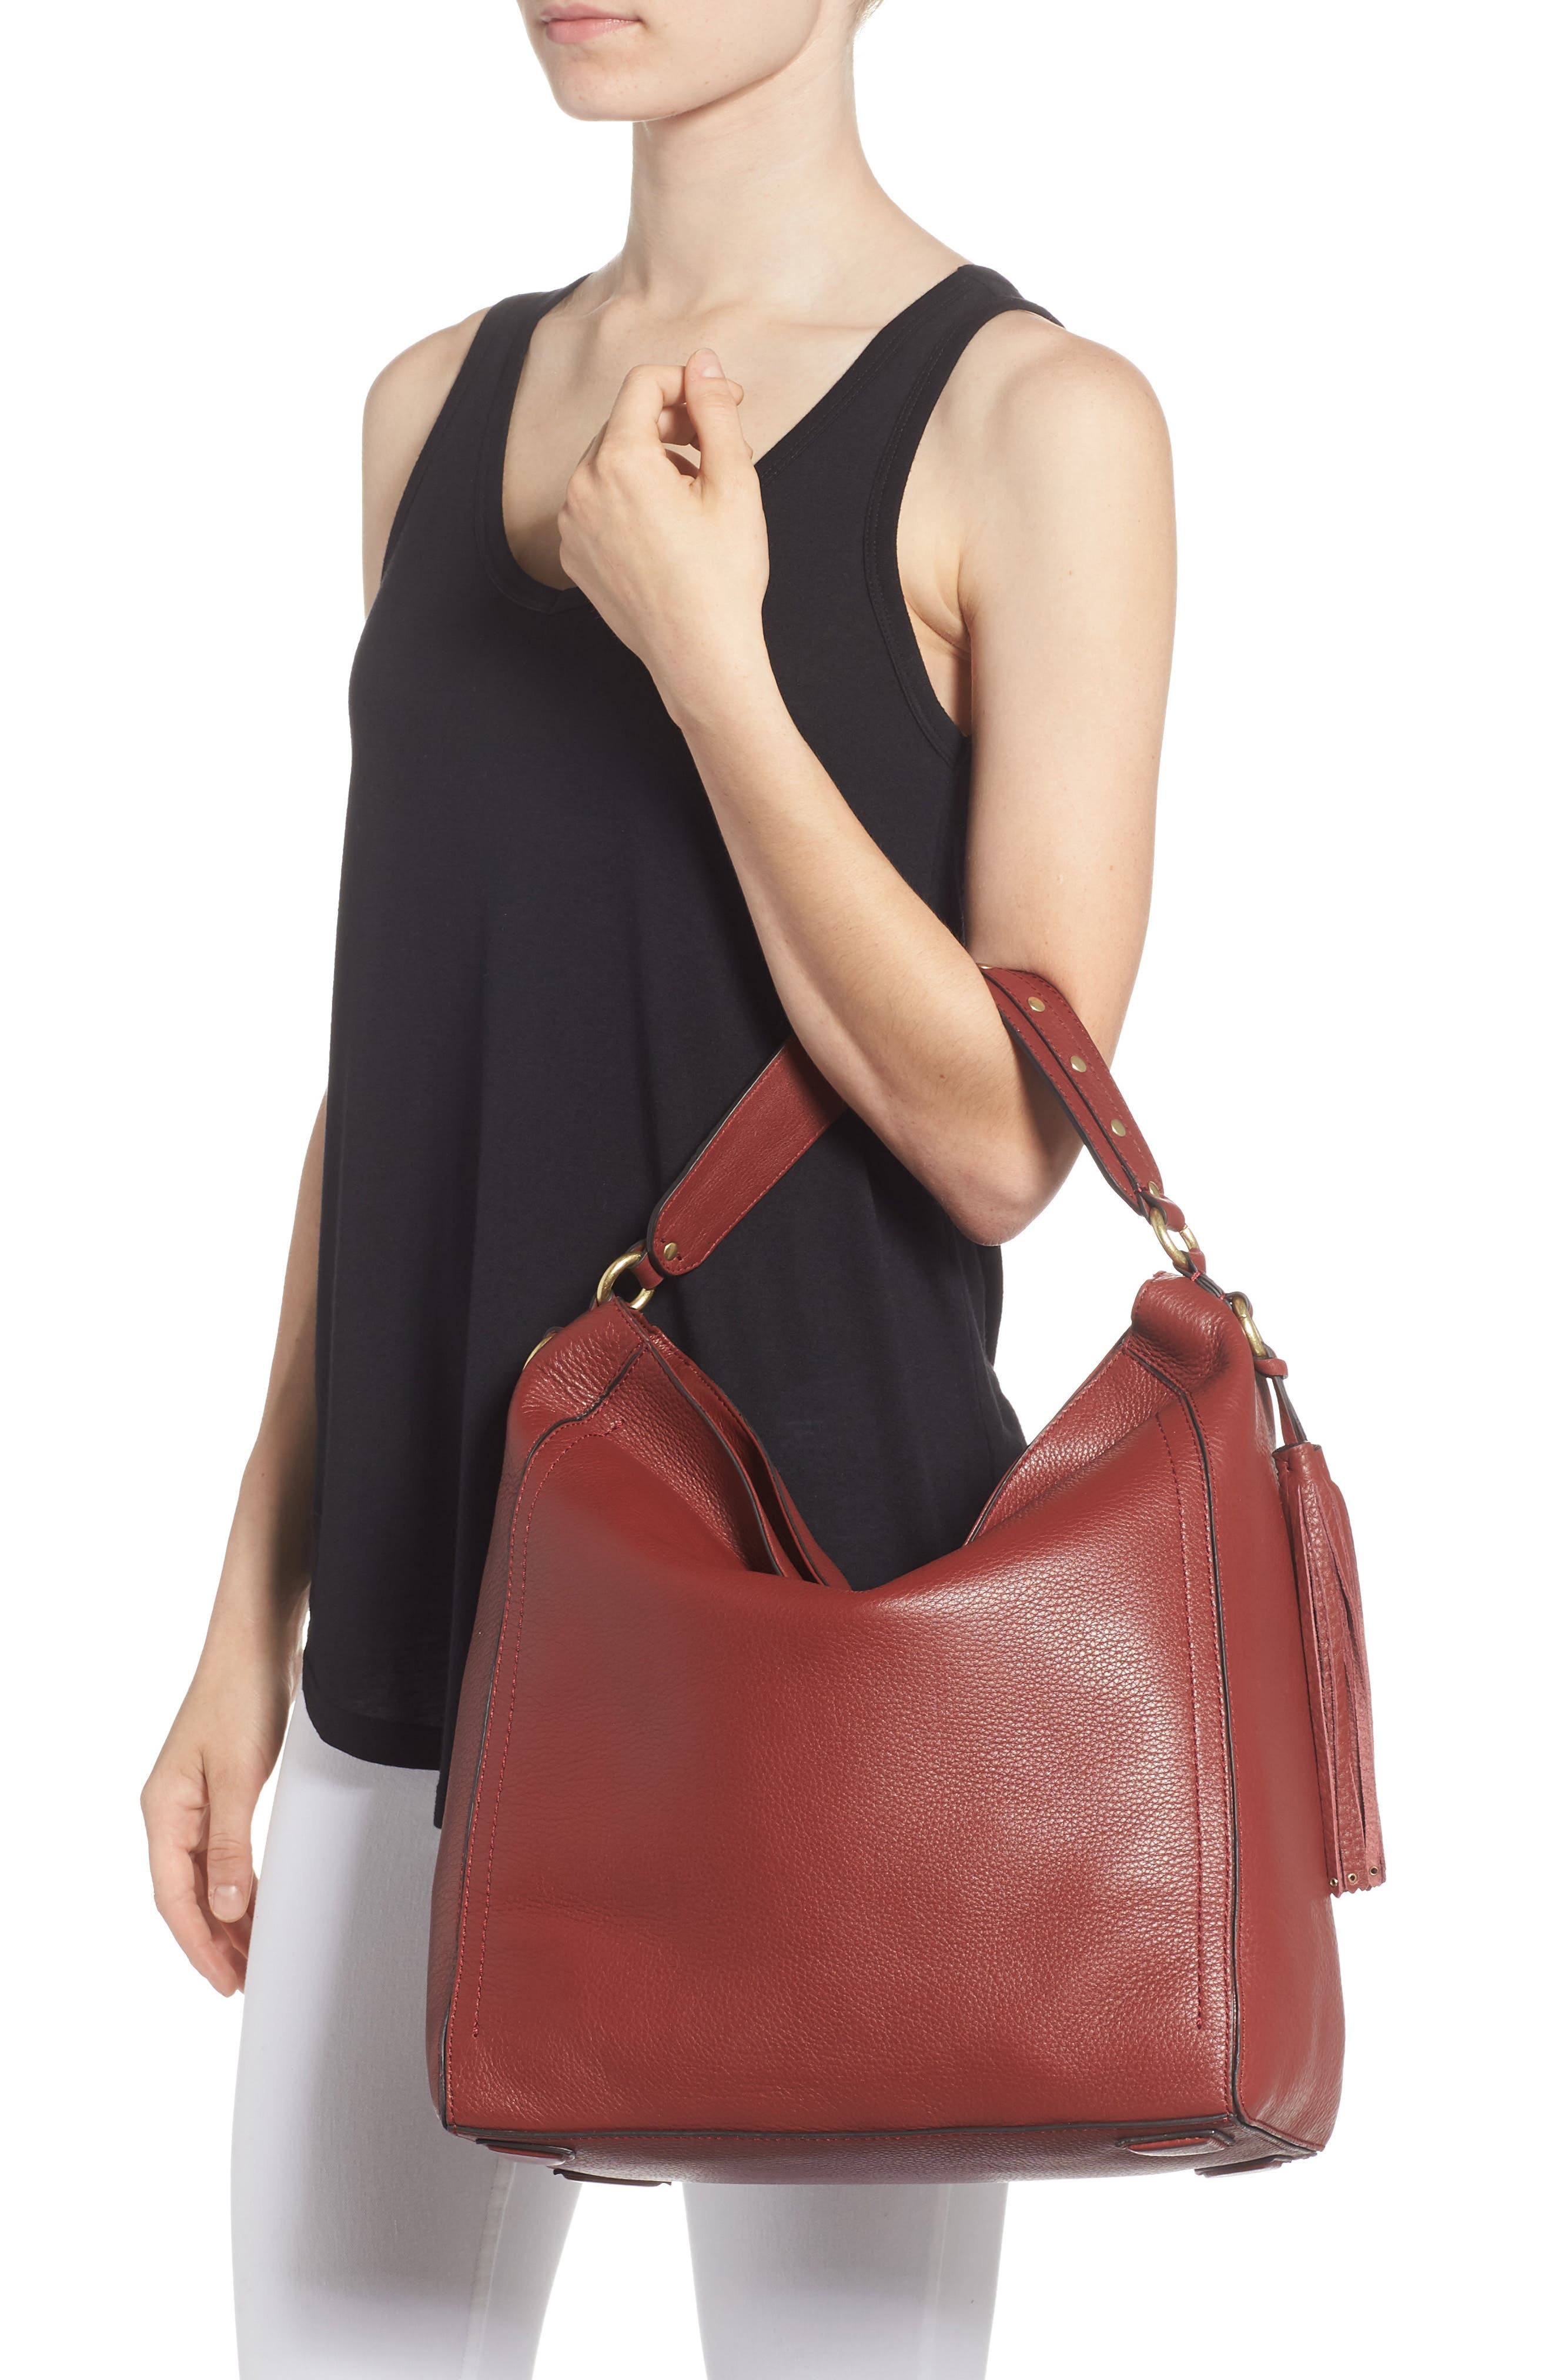 Cassidy RFID Pebbled Leather Bucket Bag,                             Alternate thumbnail 6, color,